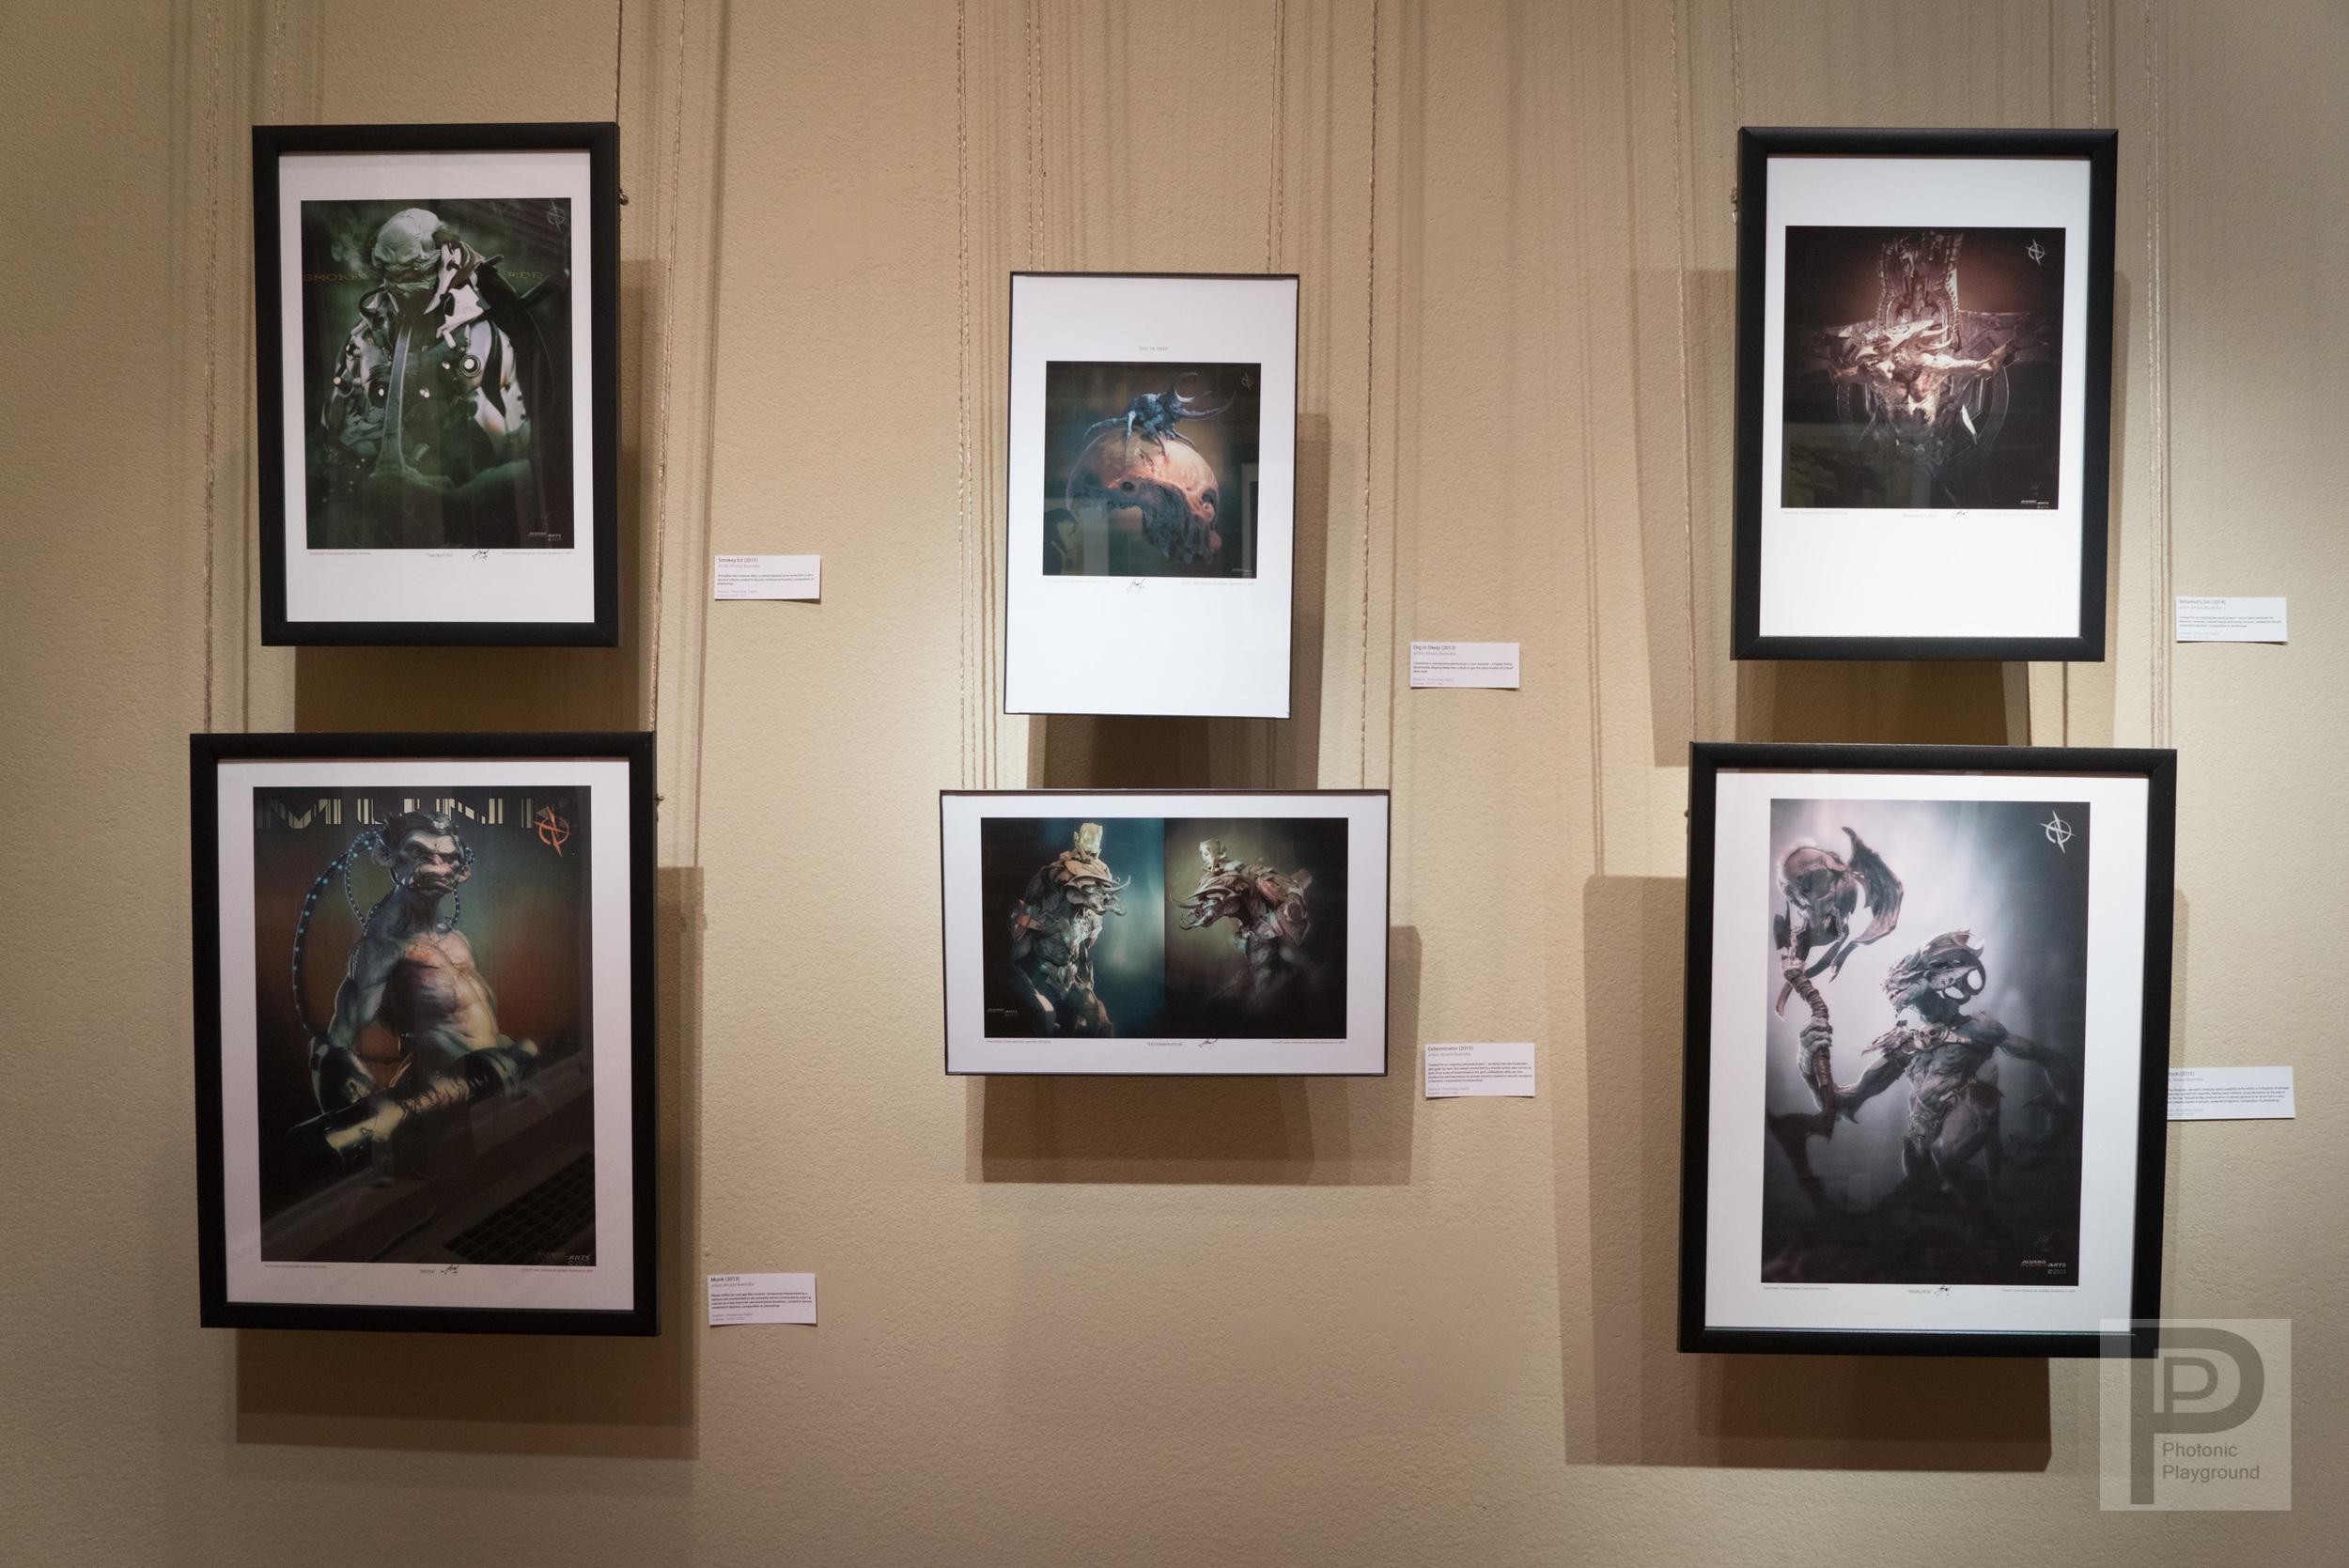 Gallery display of Alvaro Buendia'sart.